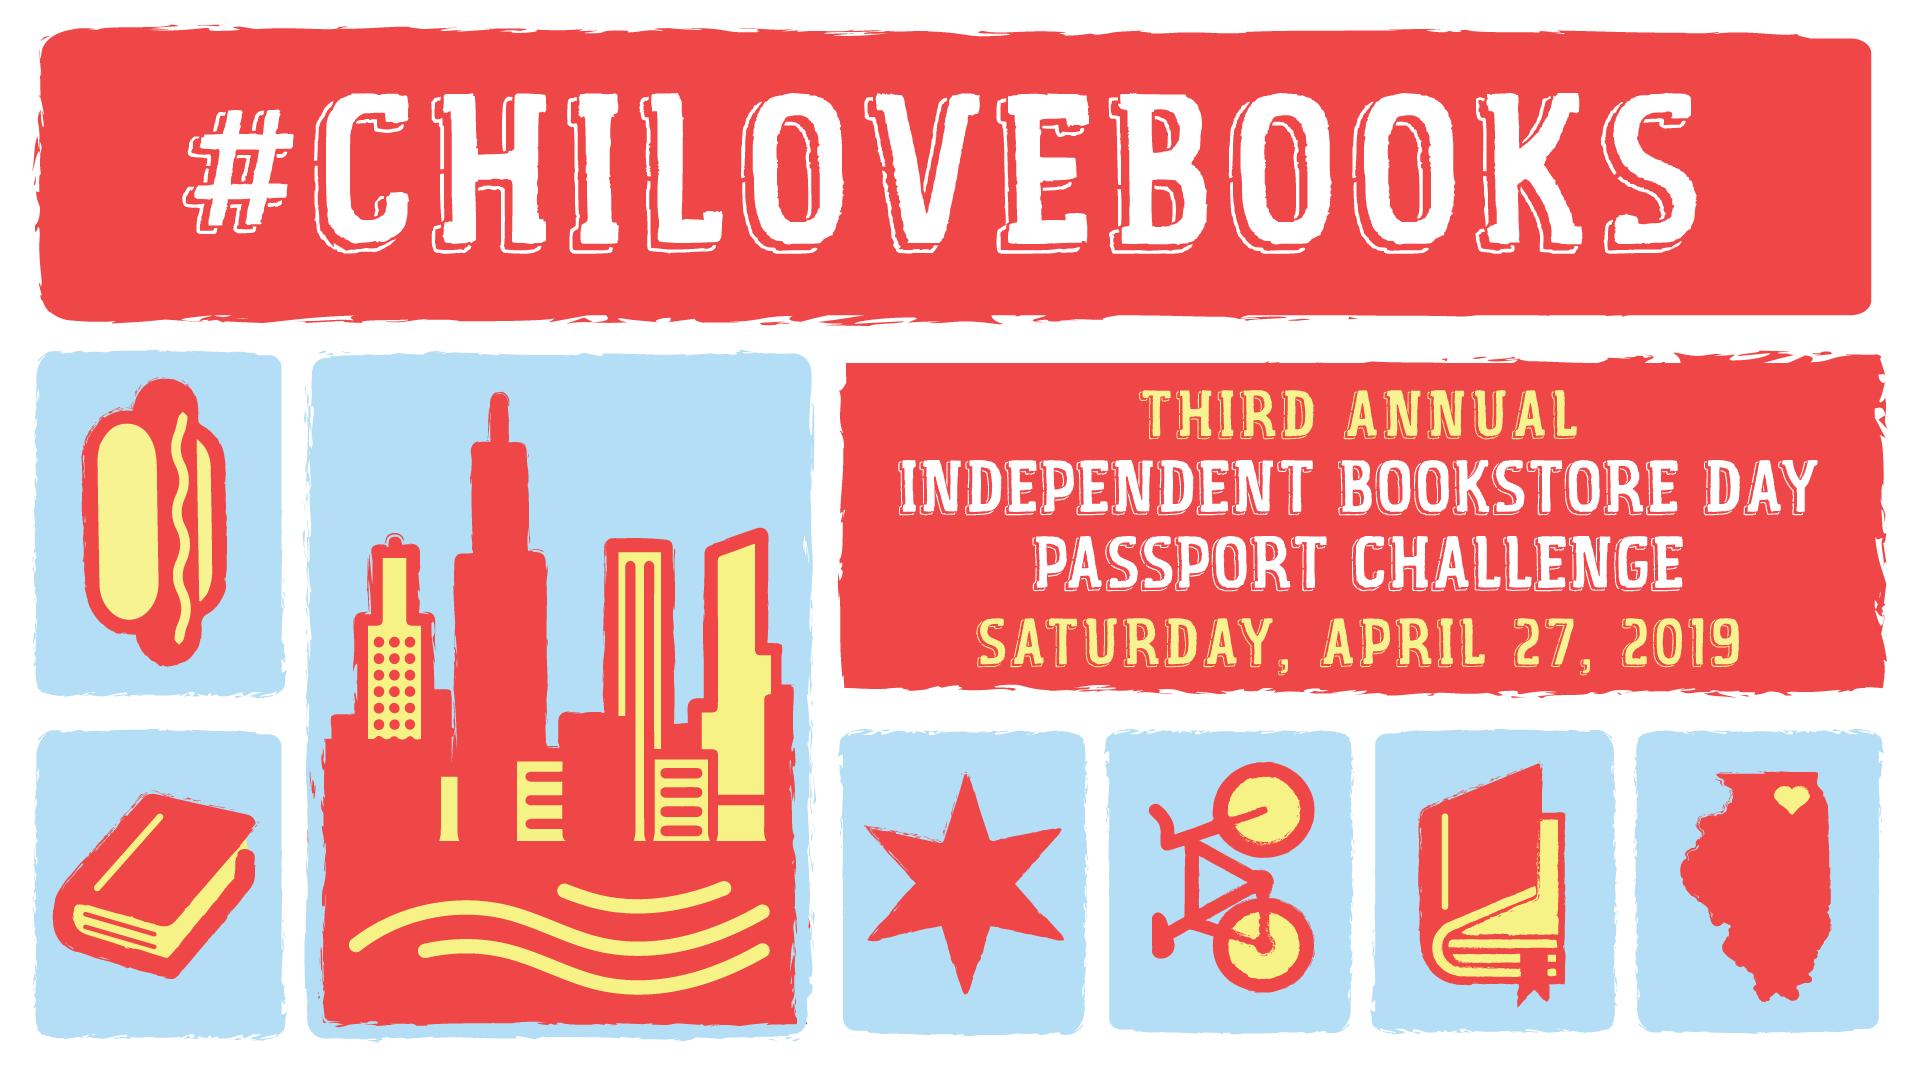 CHILOVEBOOKS